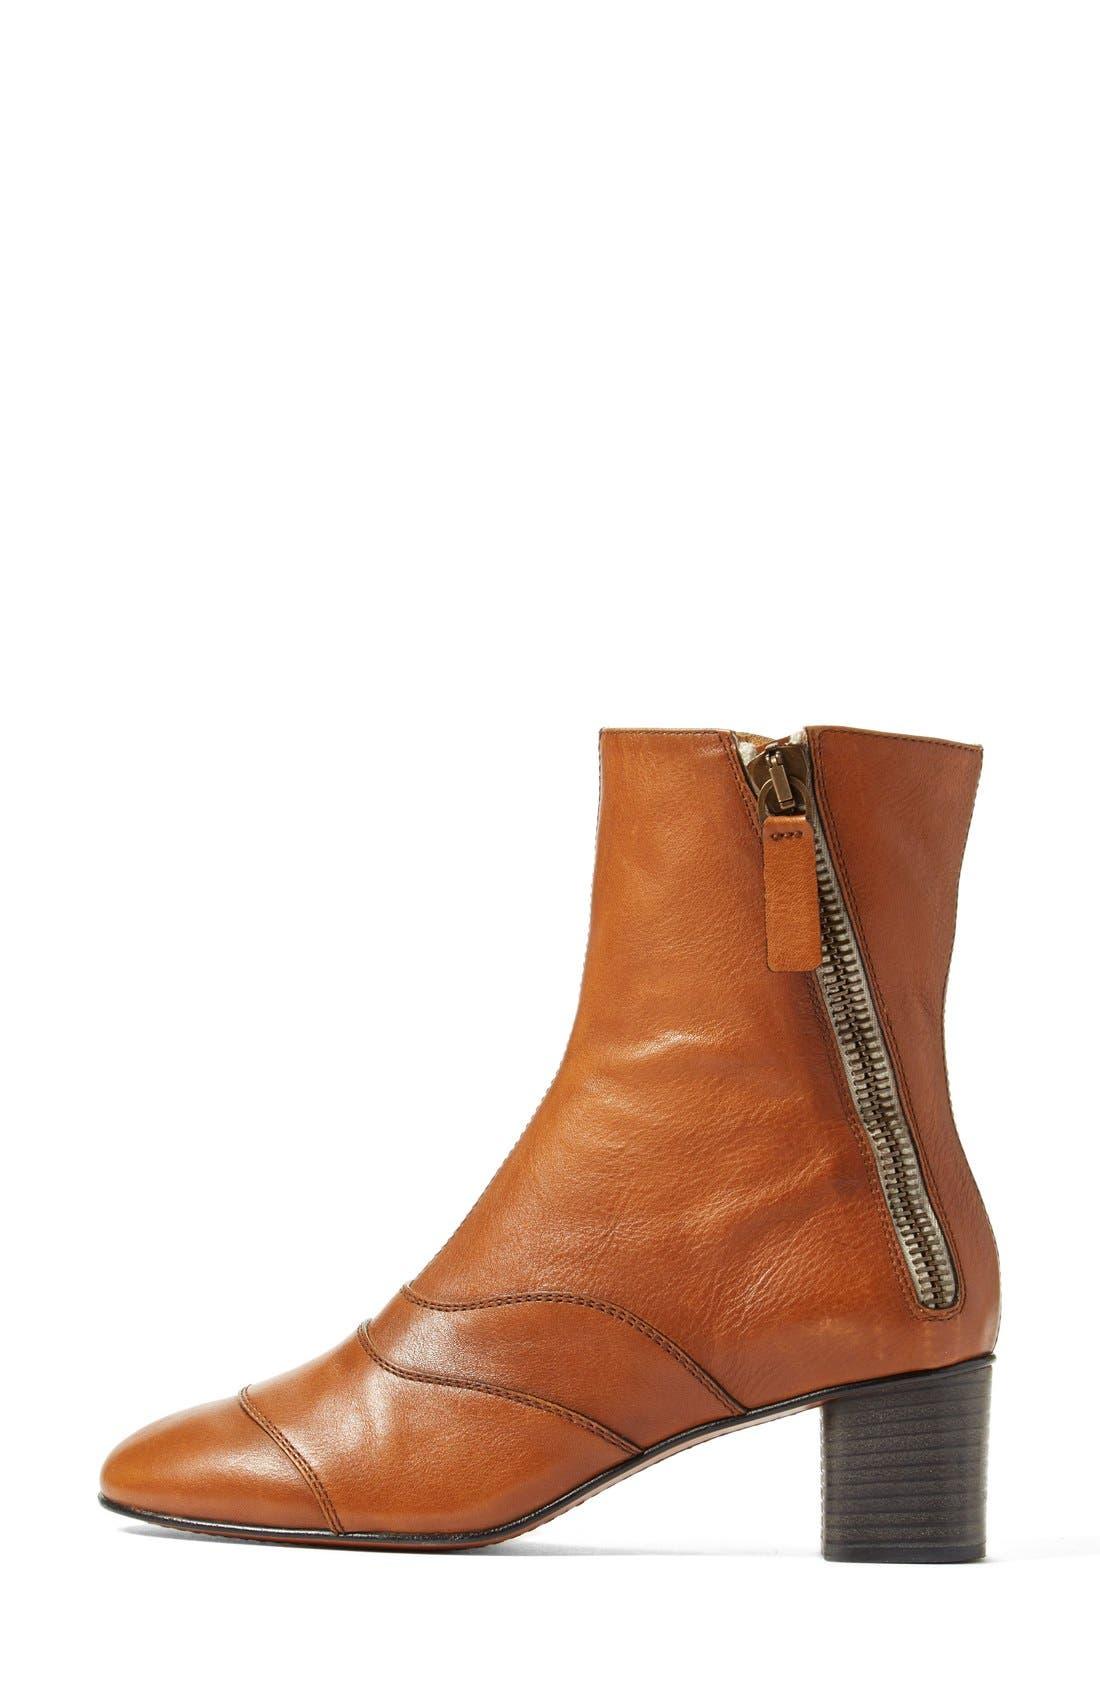 'Lexie' Block Heel Boot,                             Alternate thumbnail 8, color,